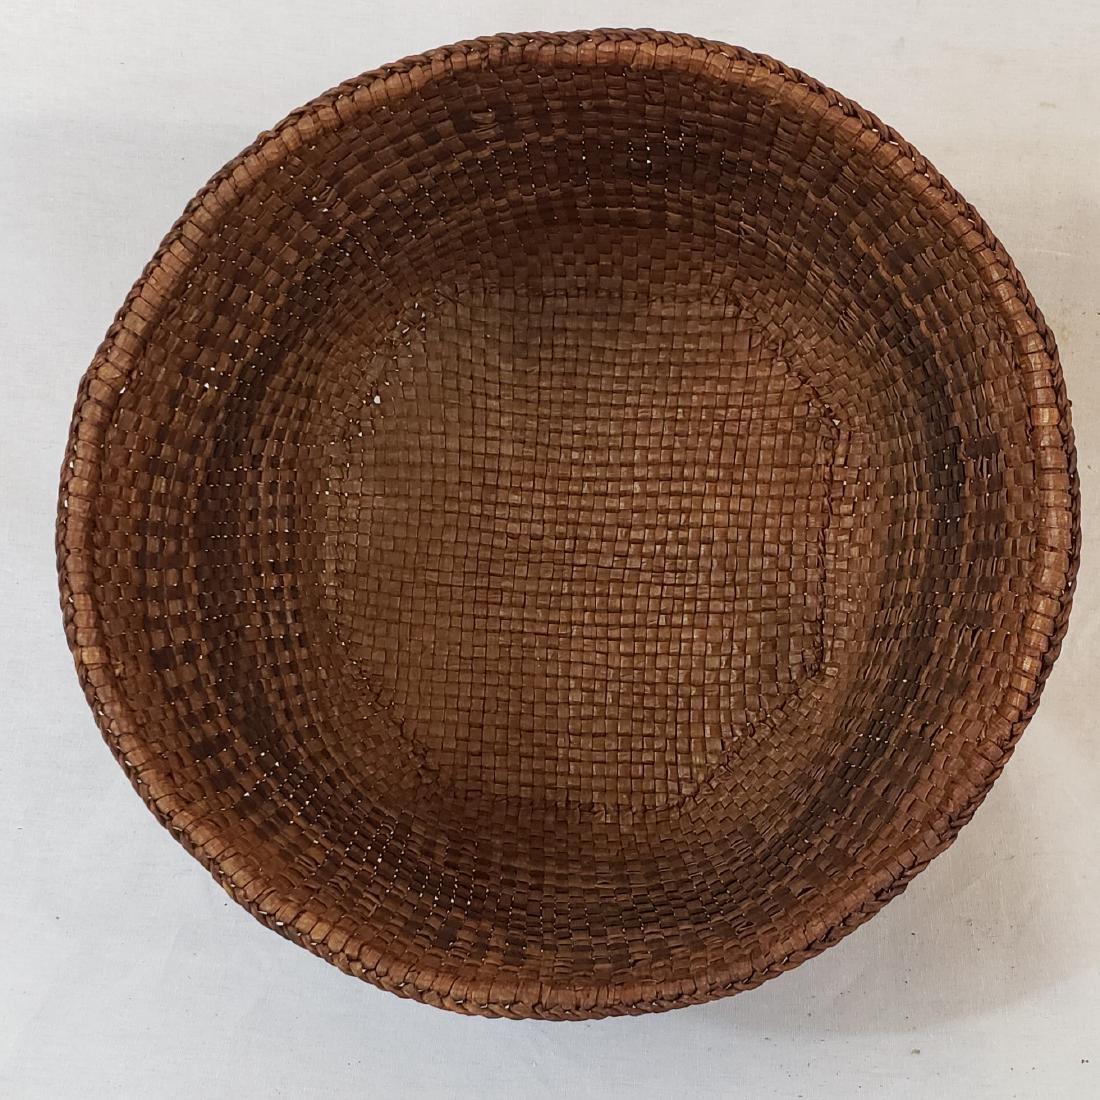 Woven cedar bark Northwest coast Indian basket ca 1900 - 2